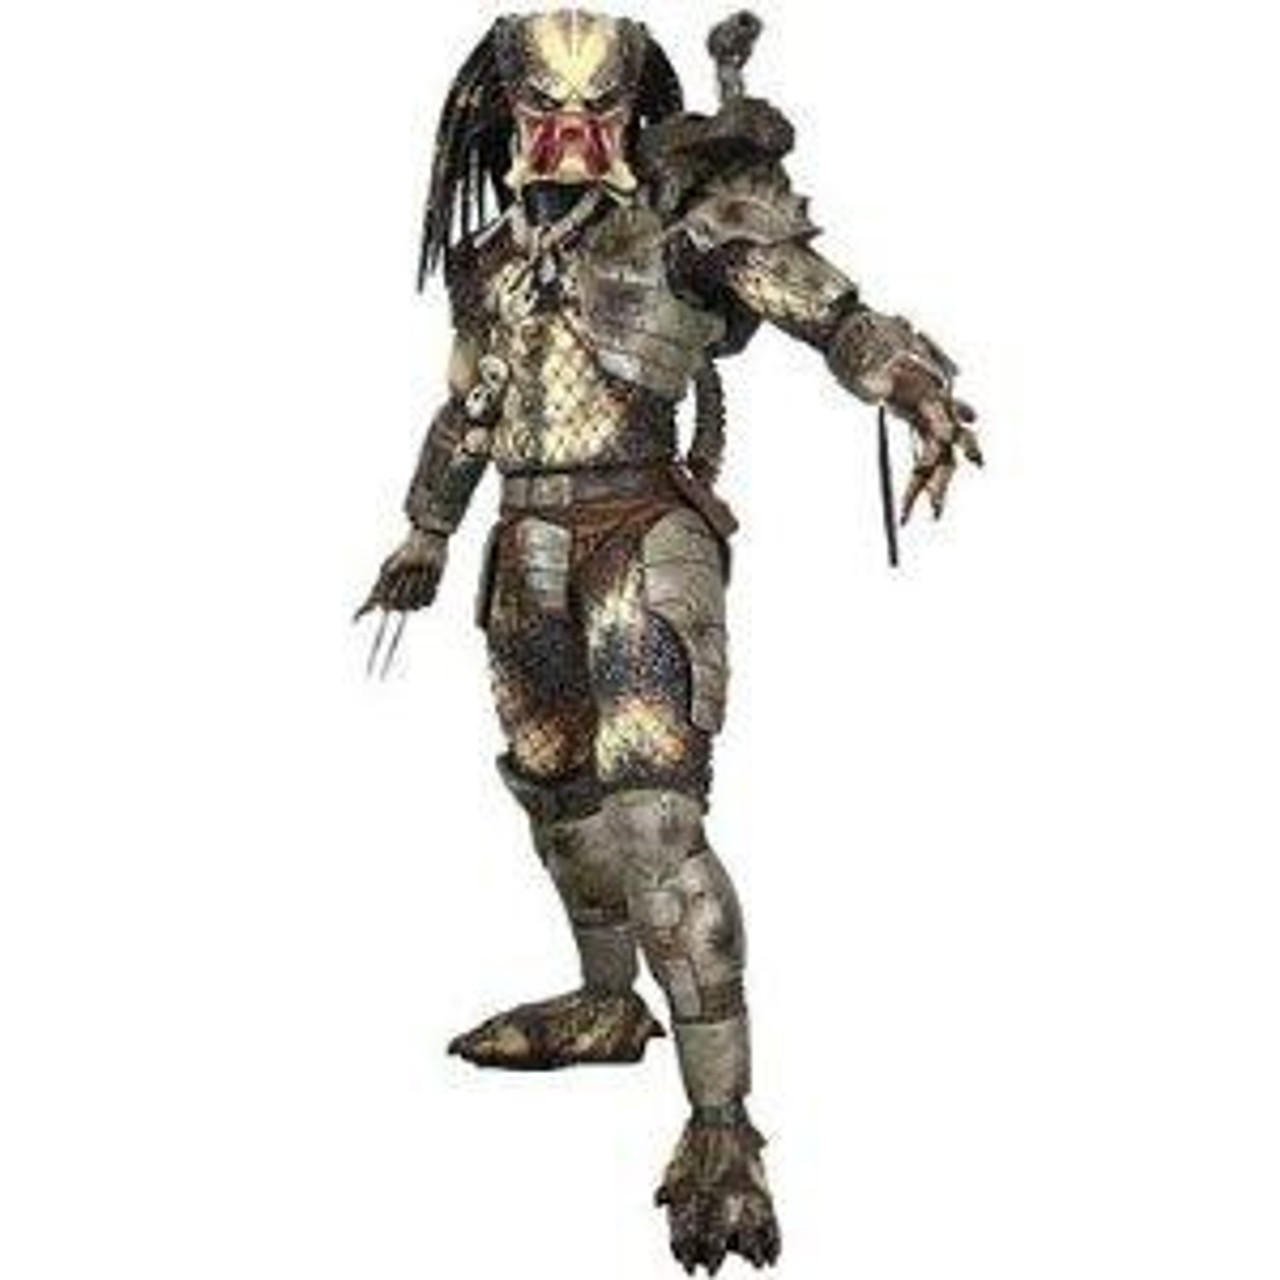 NECA Quarter Scale Classic Original Predator Action Figure [Open Mouth]